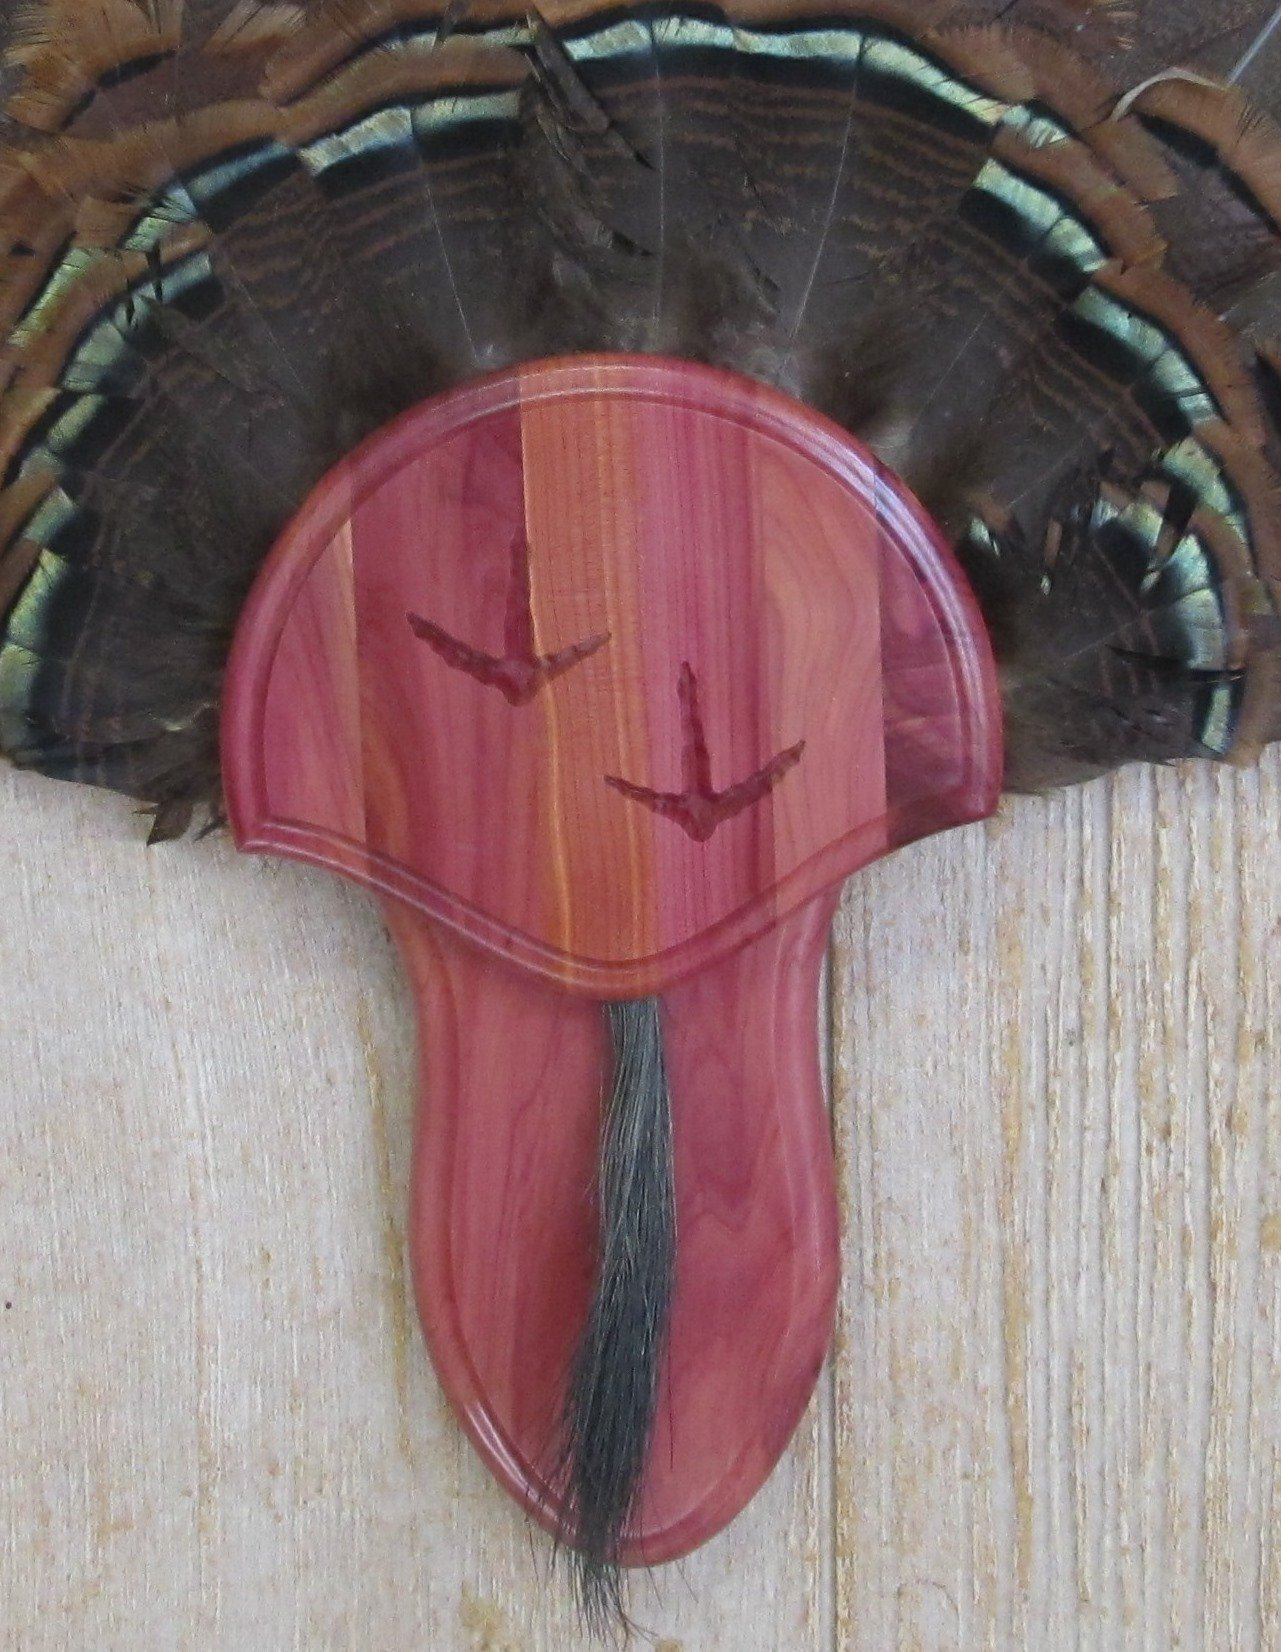 Taxidermists Woodshop The Cedar Carved Turkey Mounting Kit with Beard Plate -02